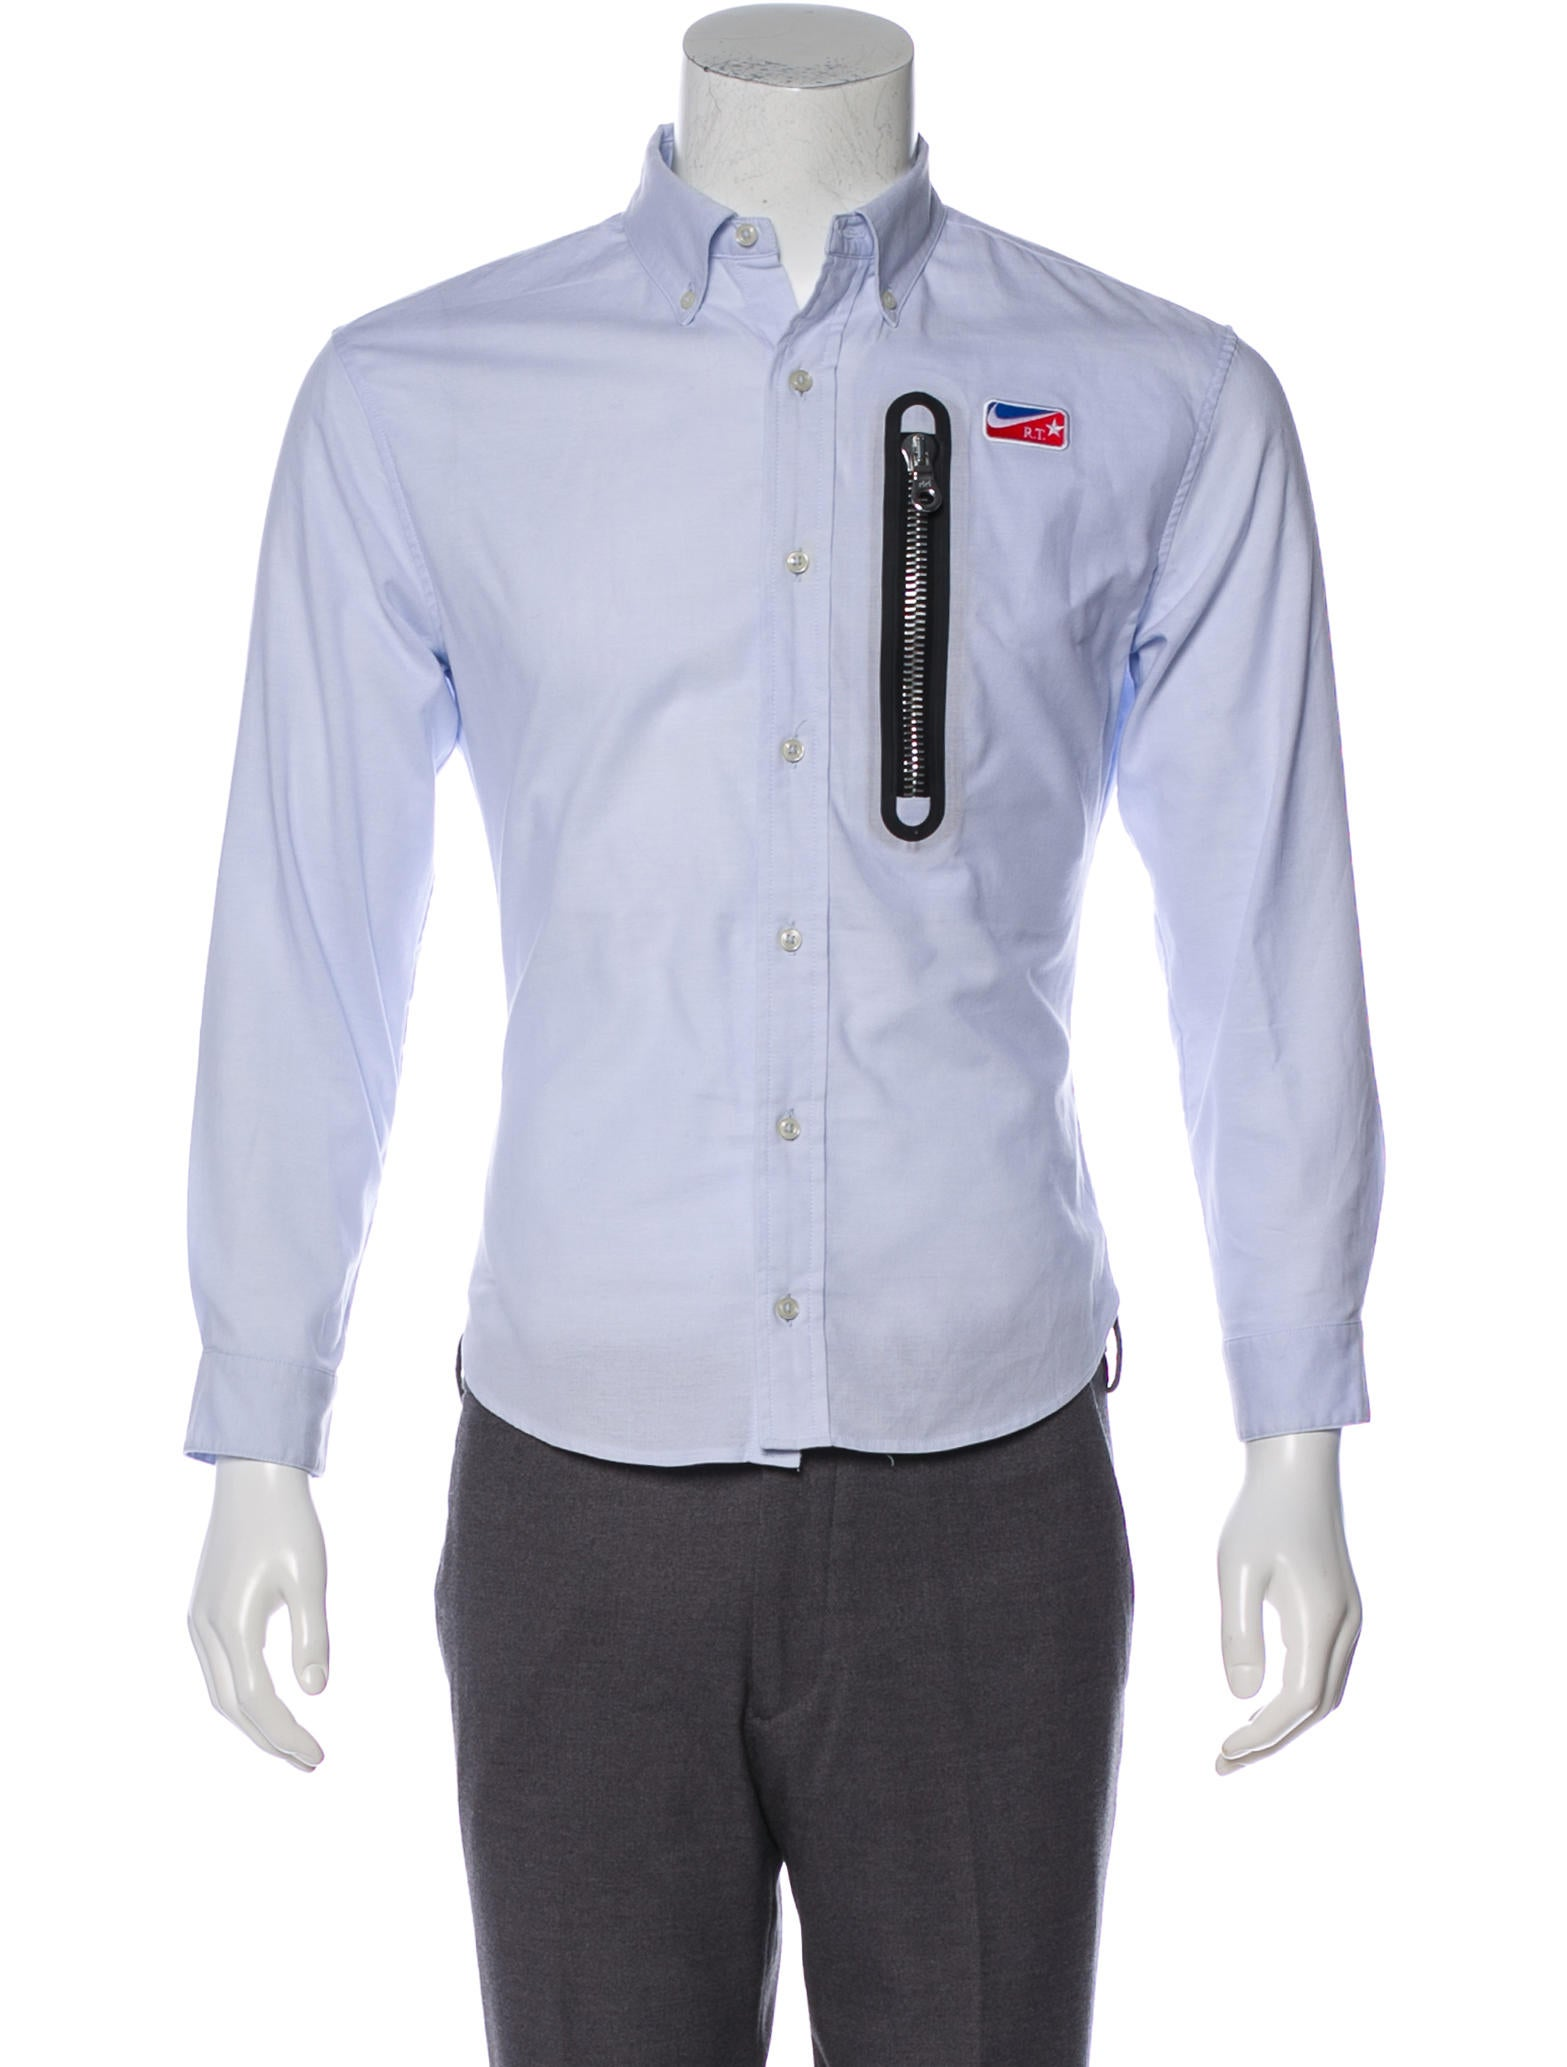 e91ebfaf5 Nike Woven Button-Up Shirt - Clothing - WU227343 | The RealReal